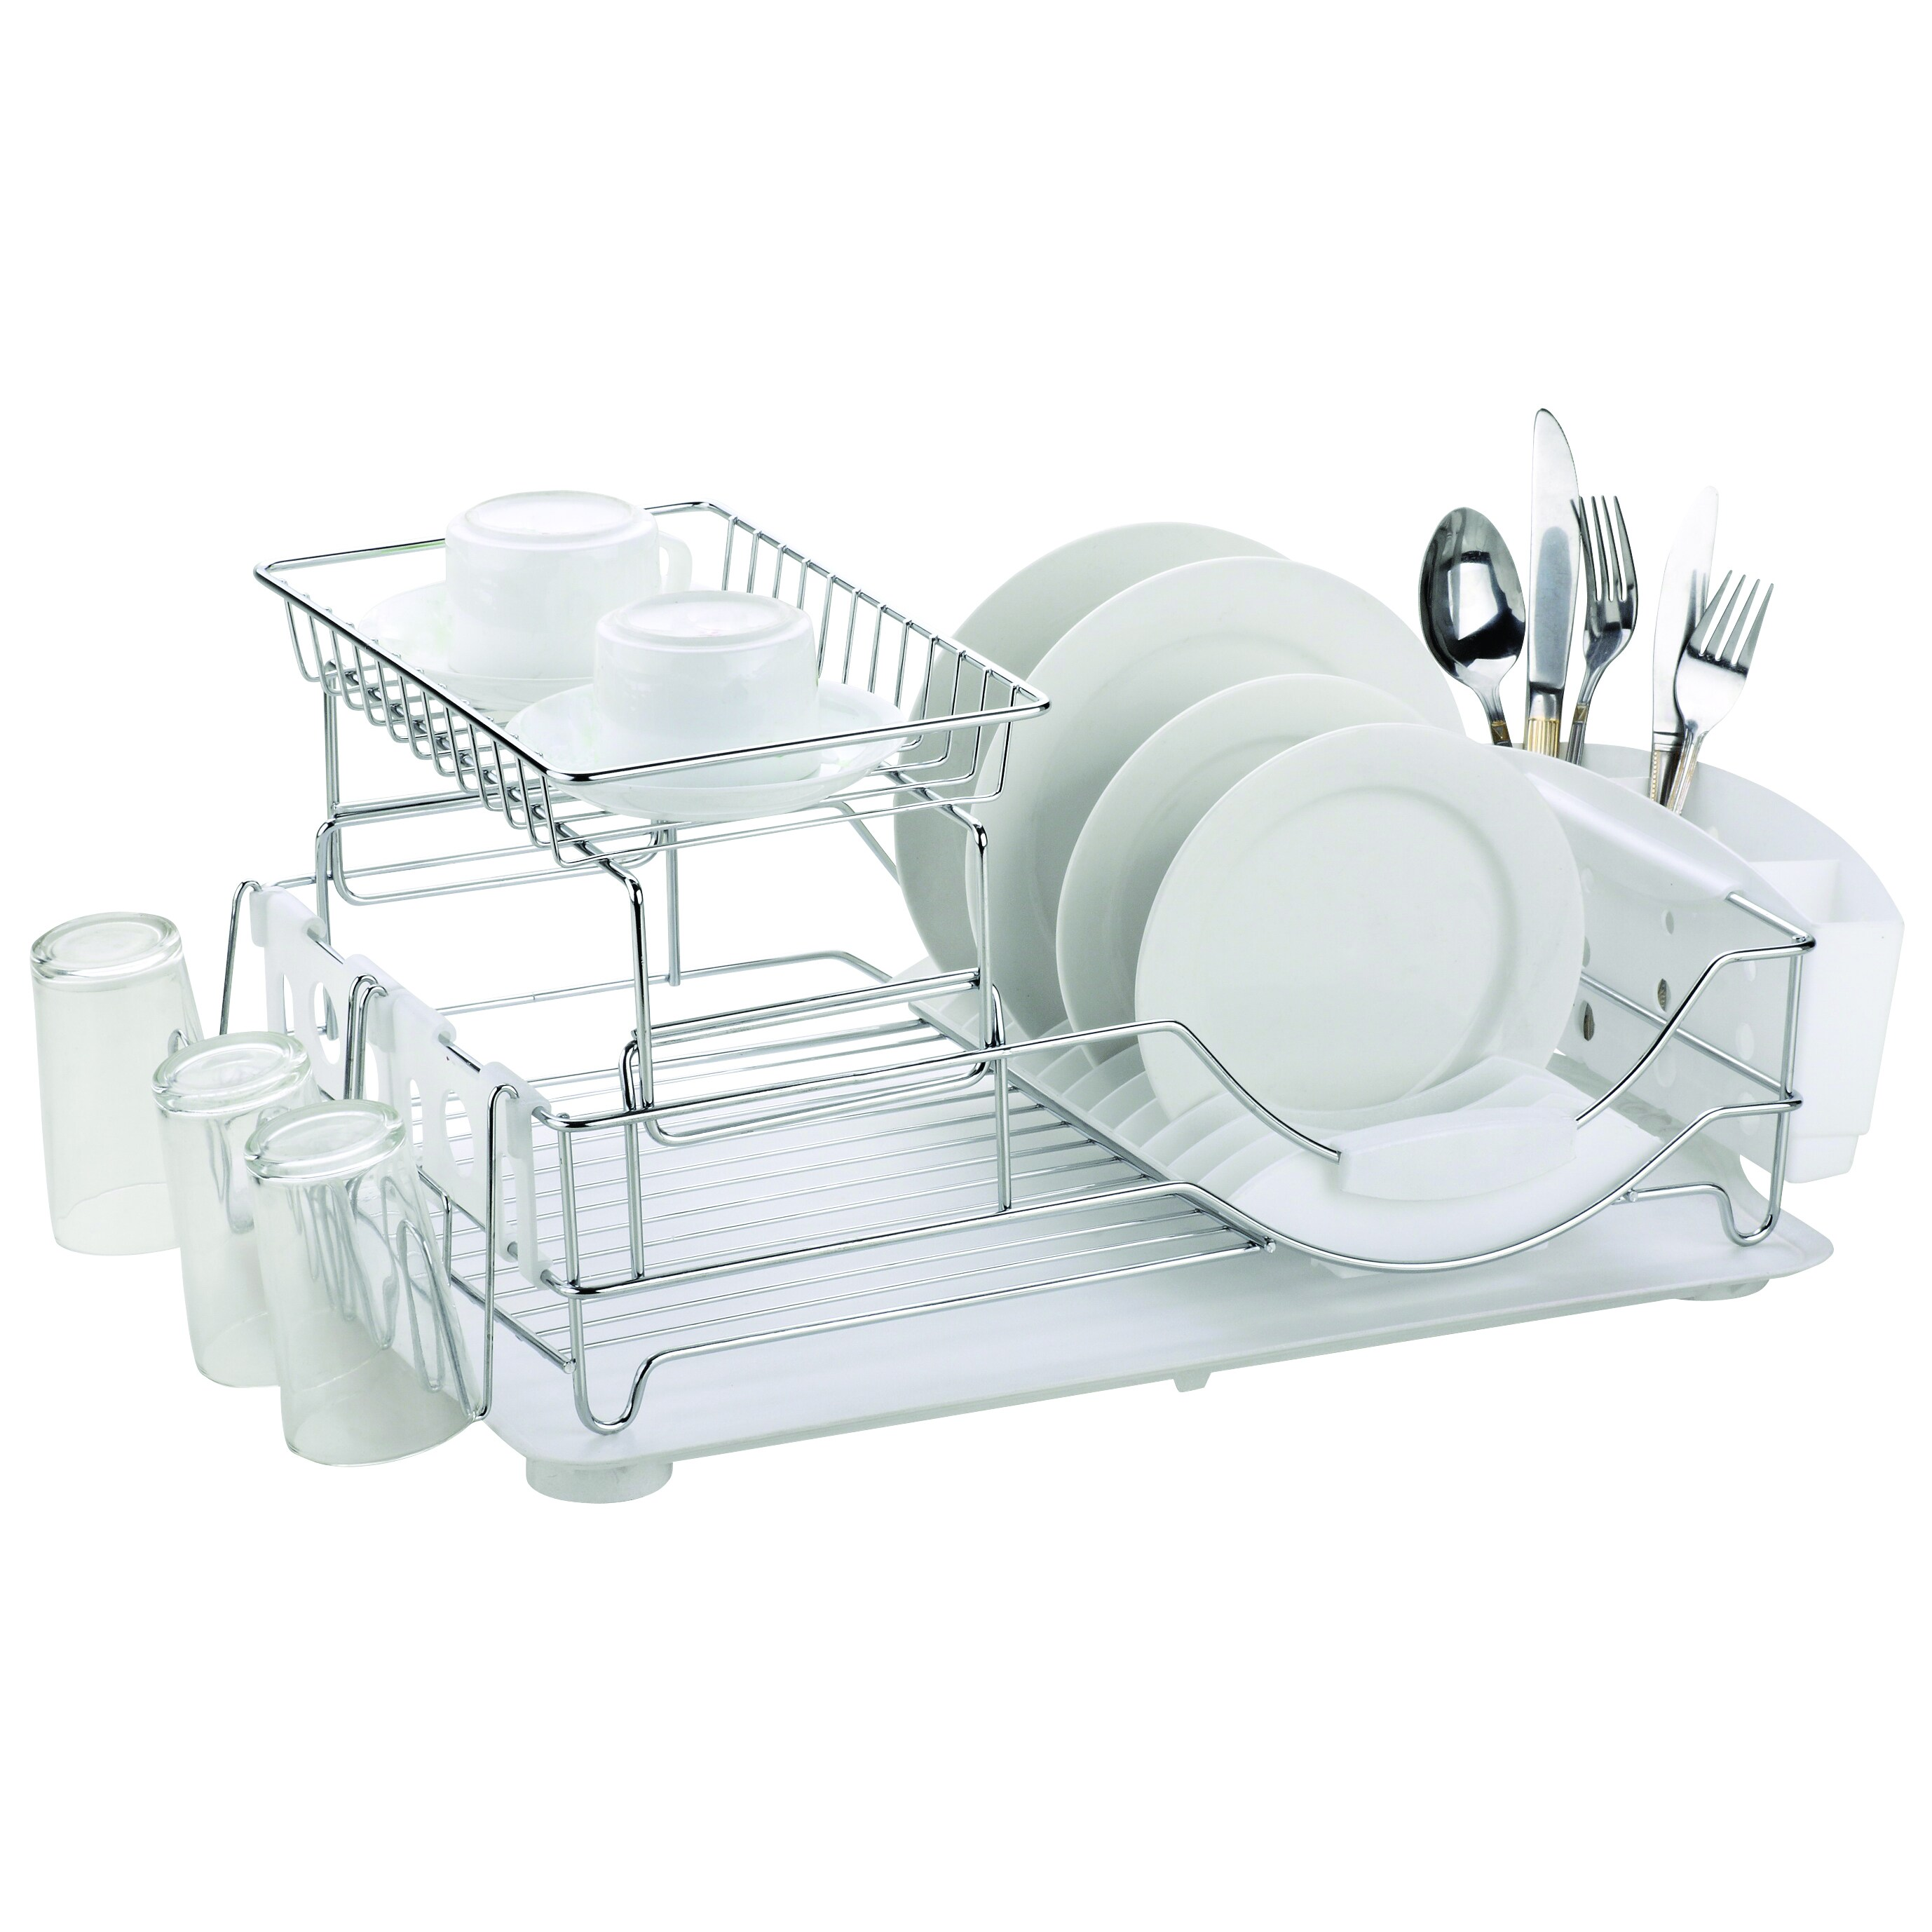 Home Basics Deluxe 2-tier Dish Rack Drainer (Black) (Metal)